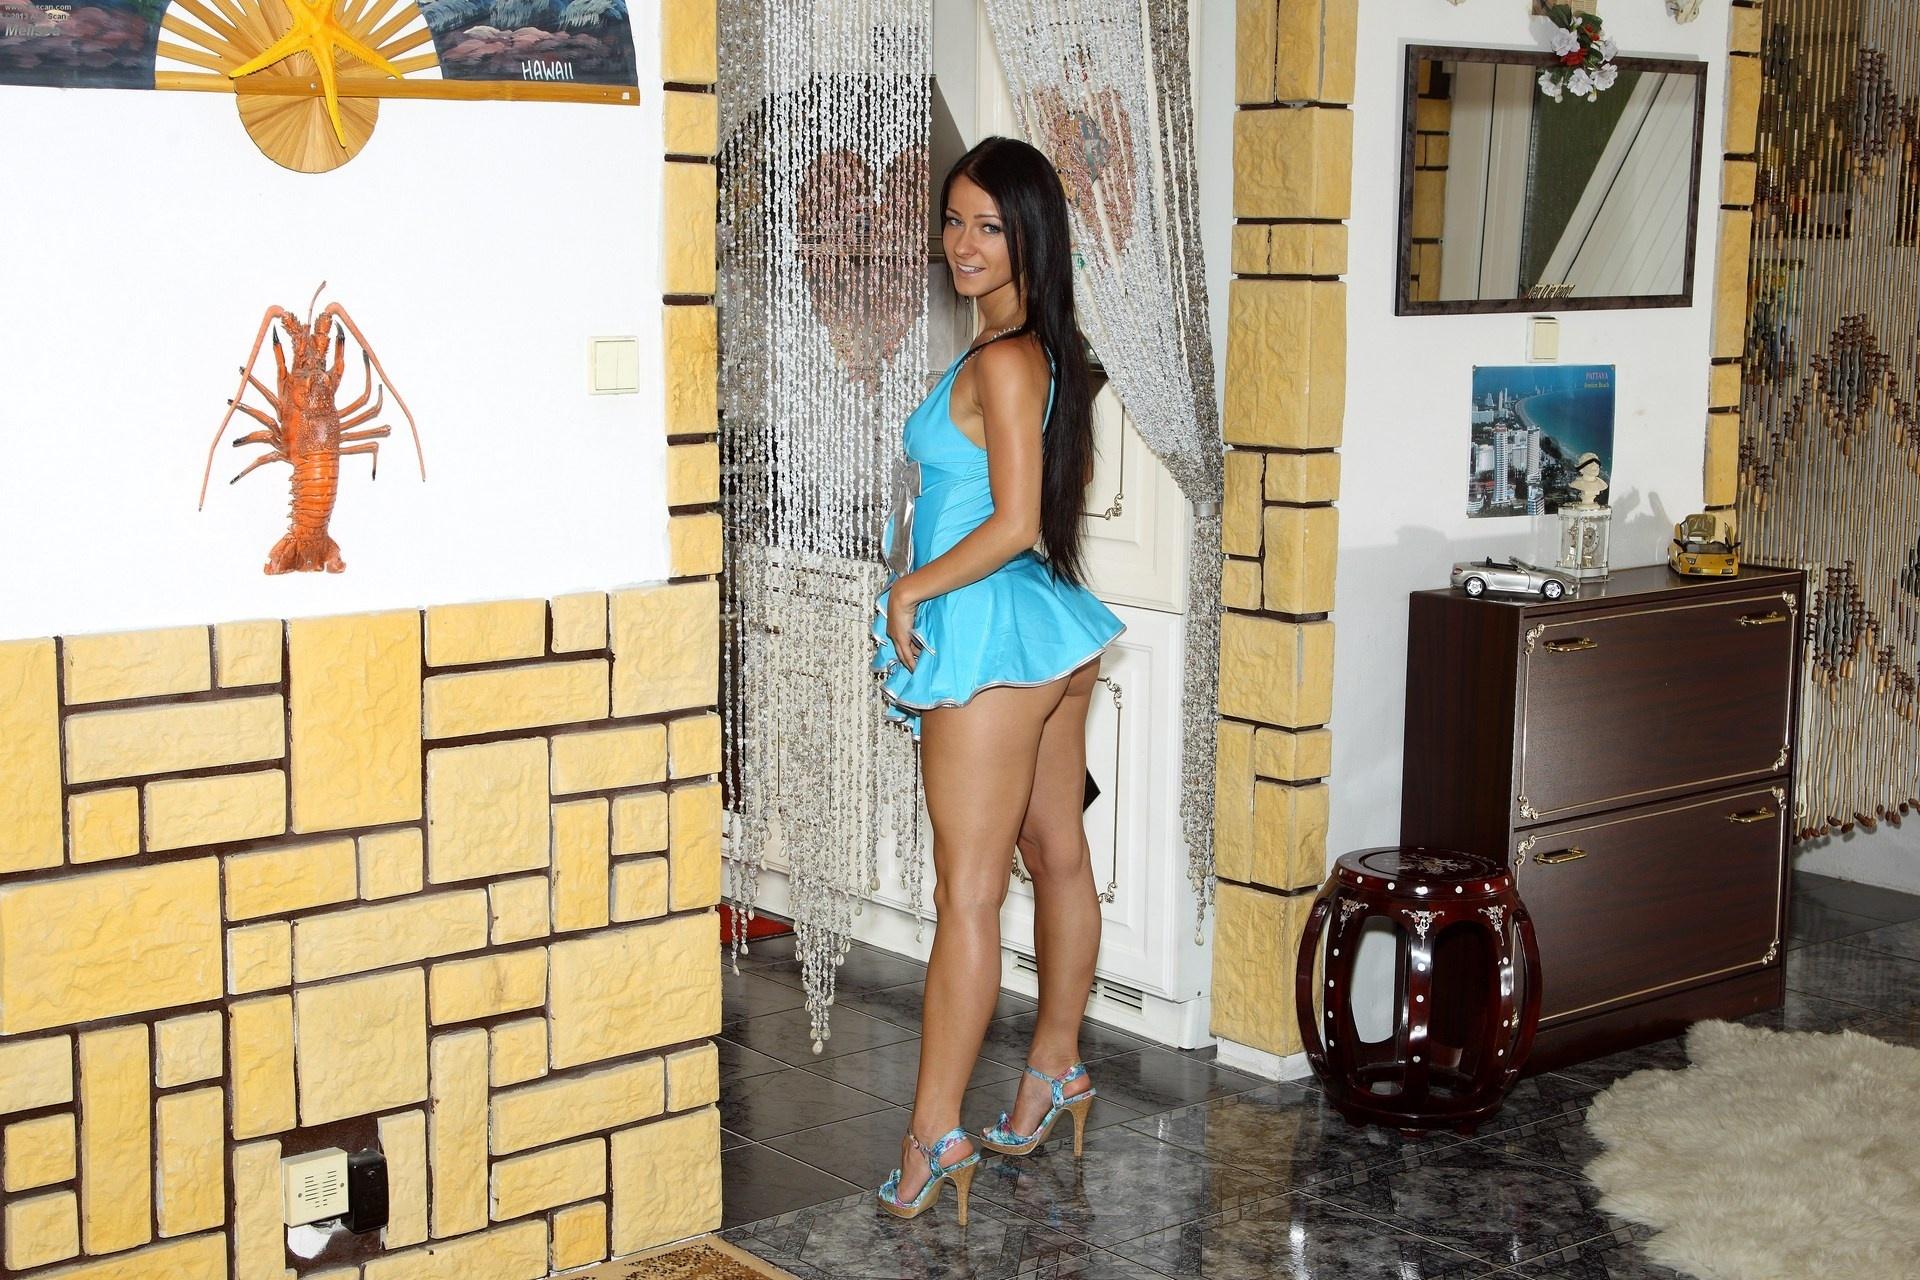 Download 1920x1280 girl, model, beauty, Melisa Mendiny